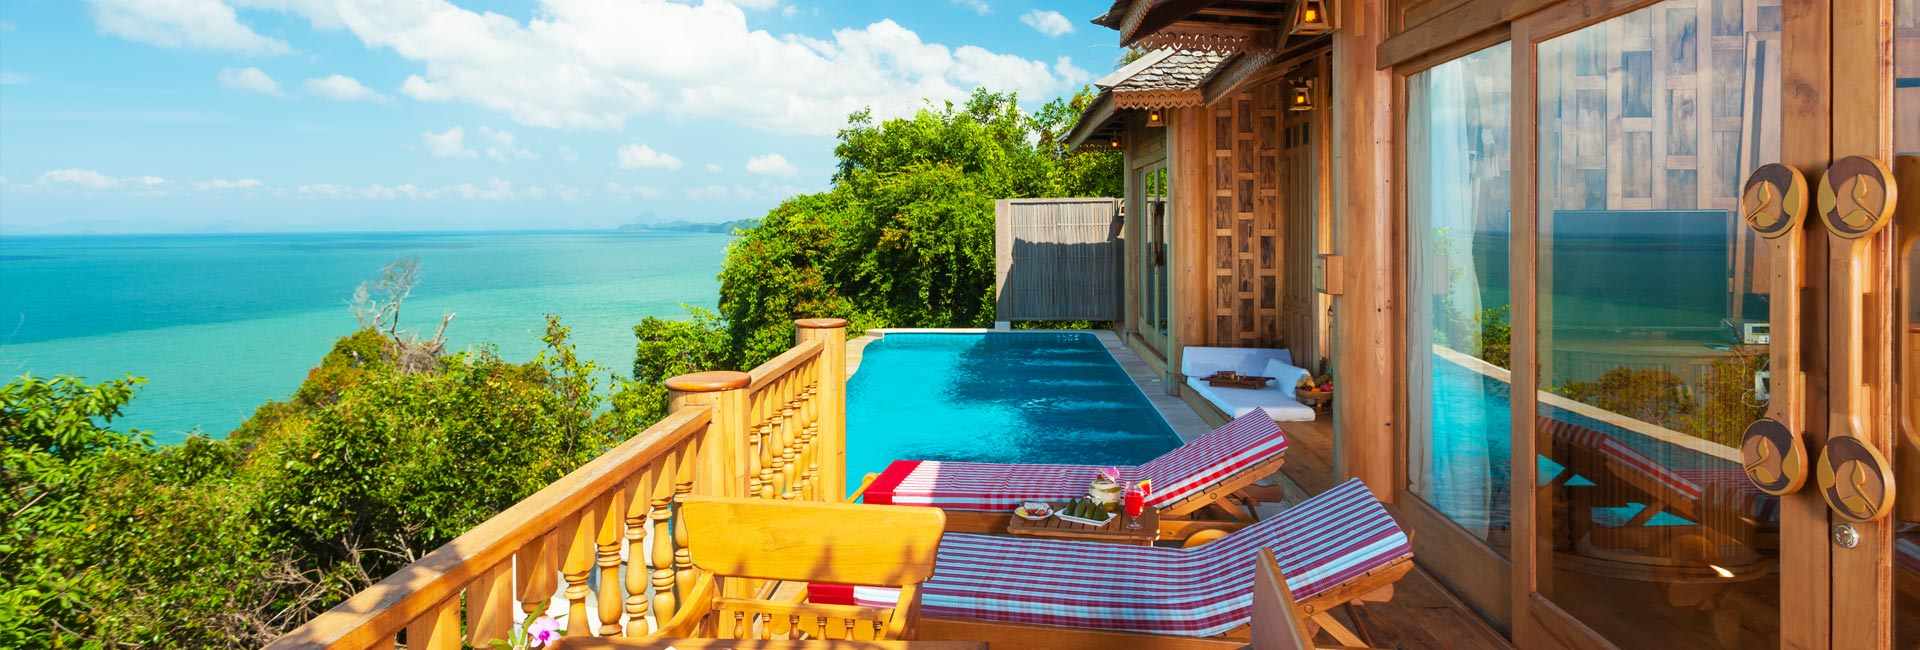 Thailand Yoga Retreat: Koh Yao Yai